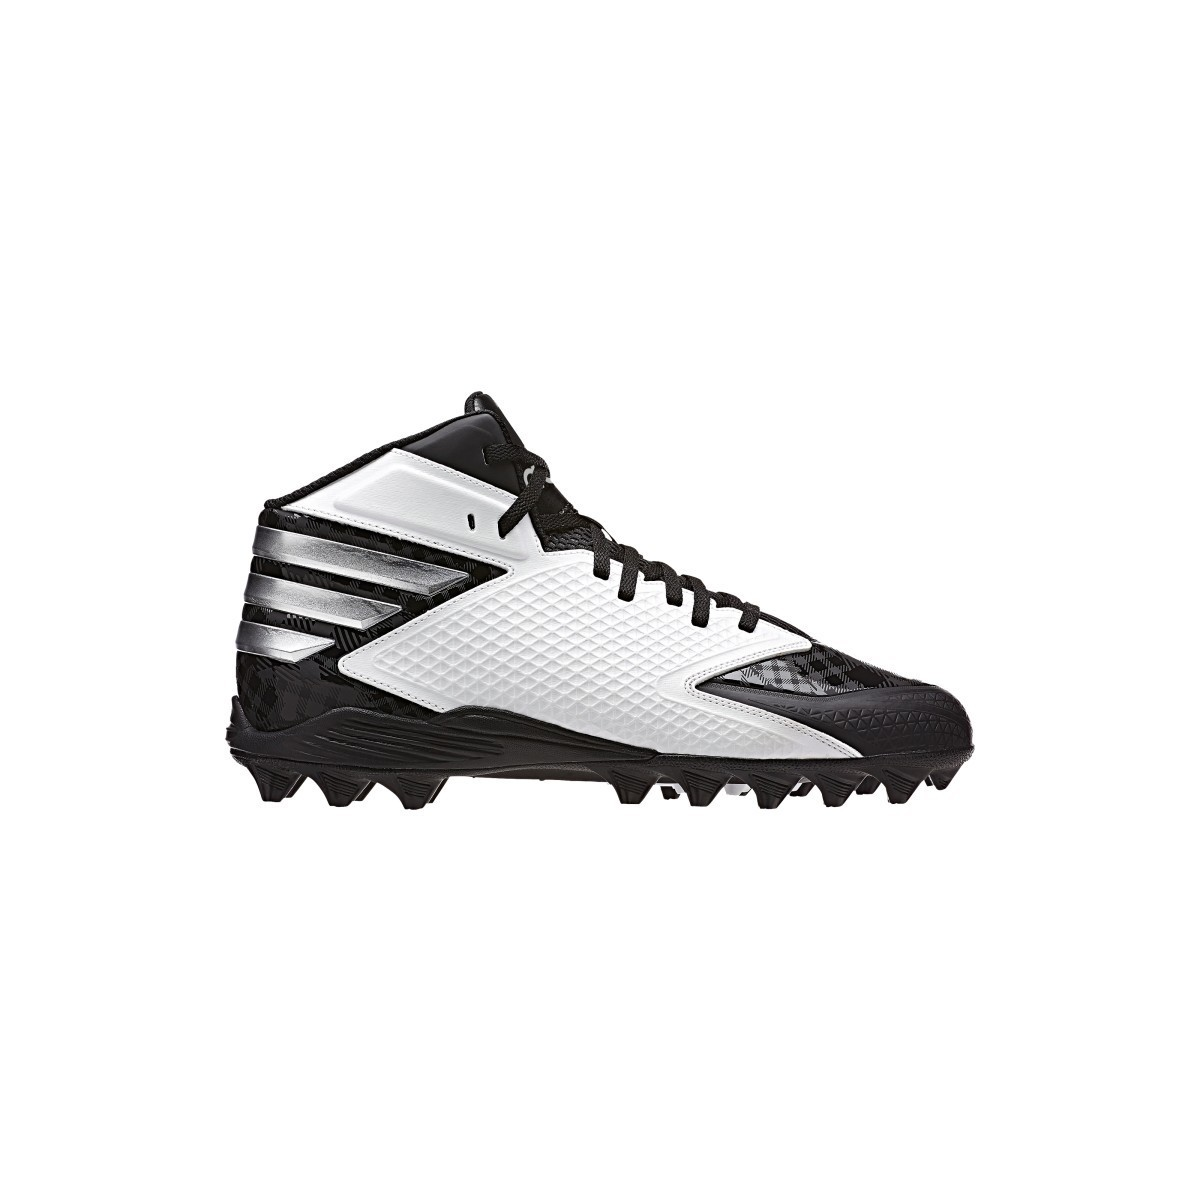 SCARPA ADIDAS FREAK MD D70143 BIANCONERO SCARPE FOOTBALL